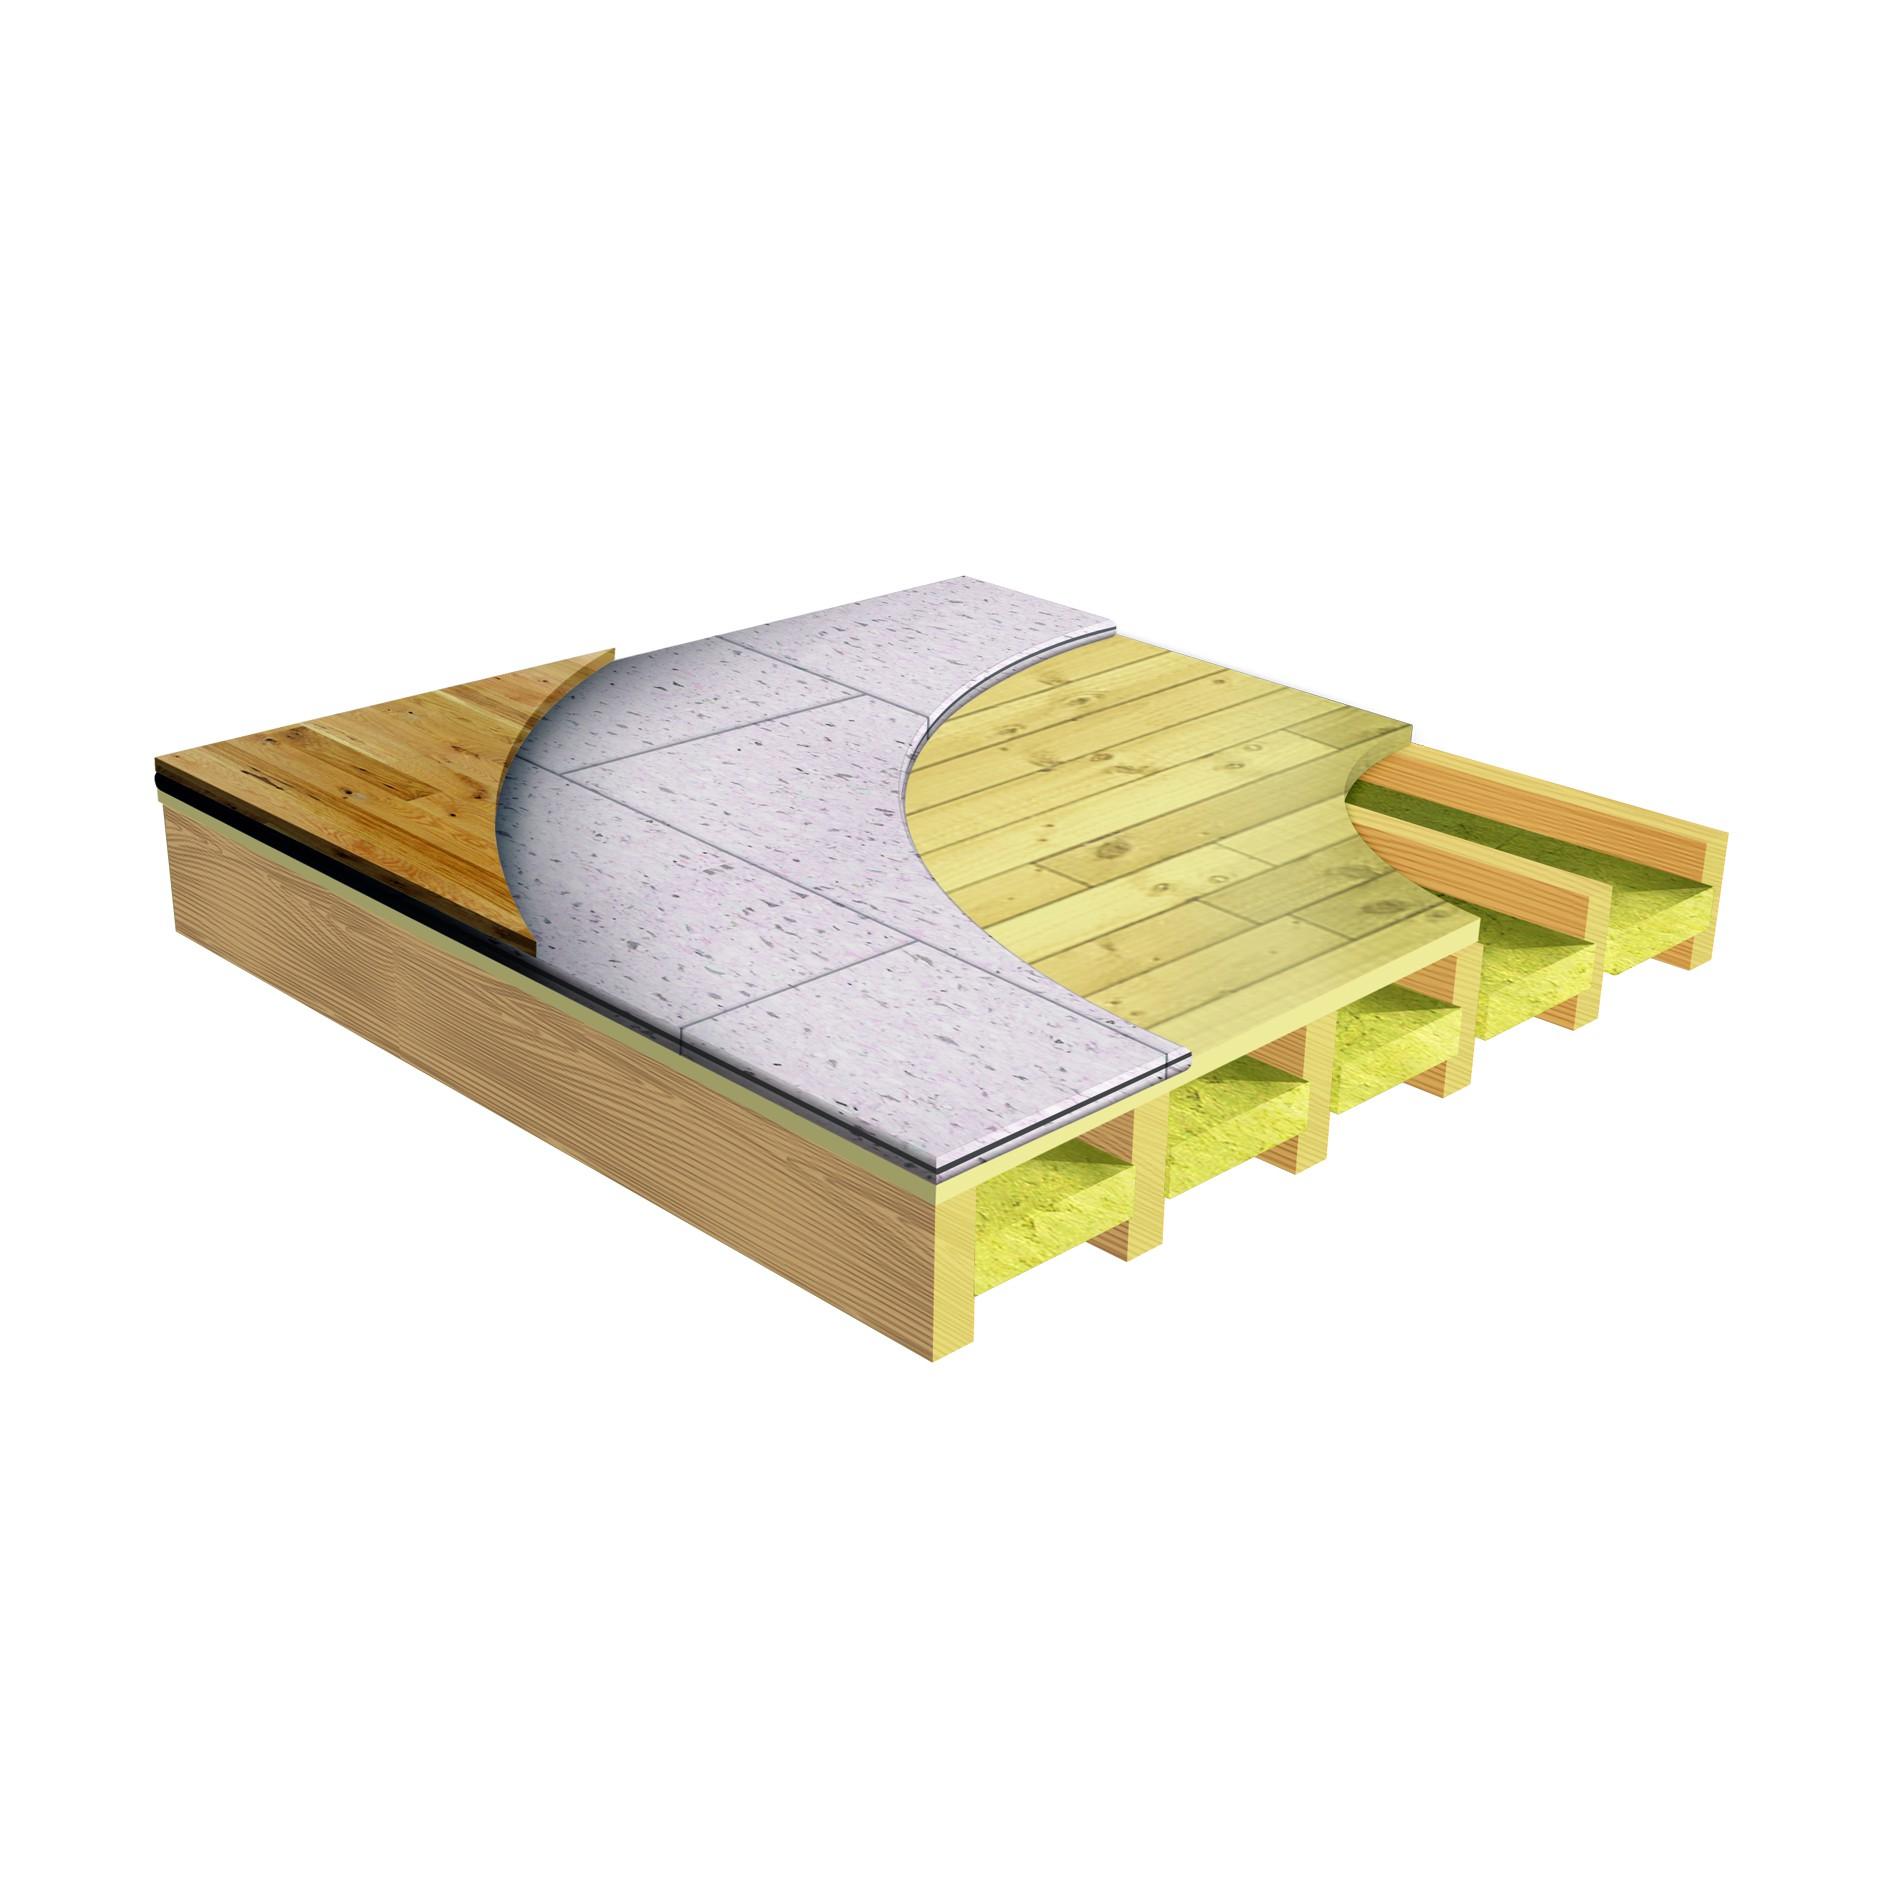 Soundproof Flooring Underlays, Soundproof Underlay For Laminate Flooring